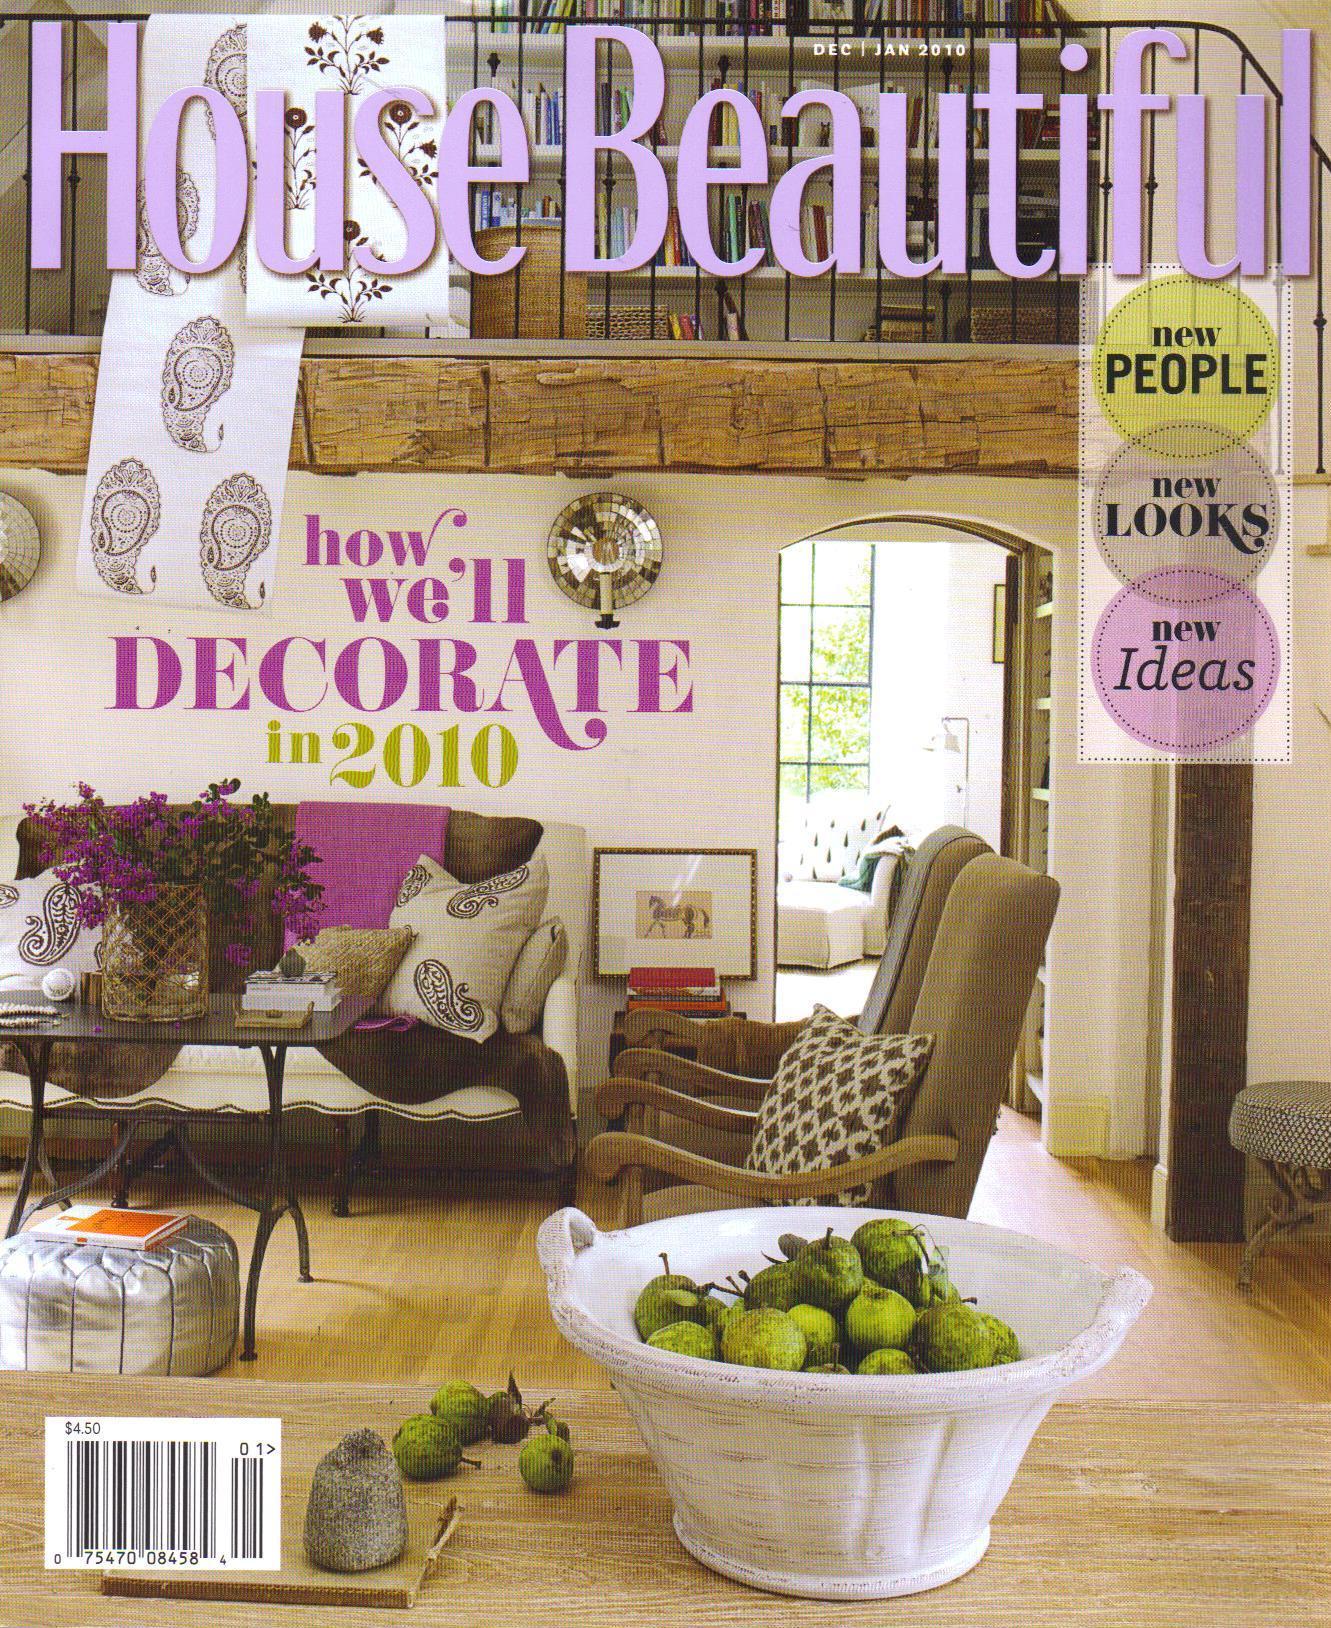 House Beautiful / January 2010